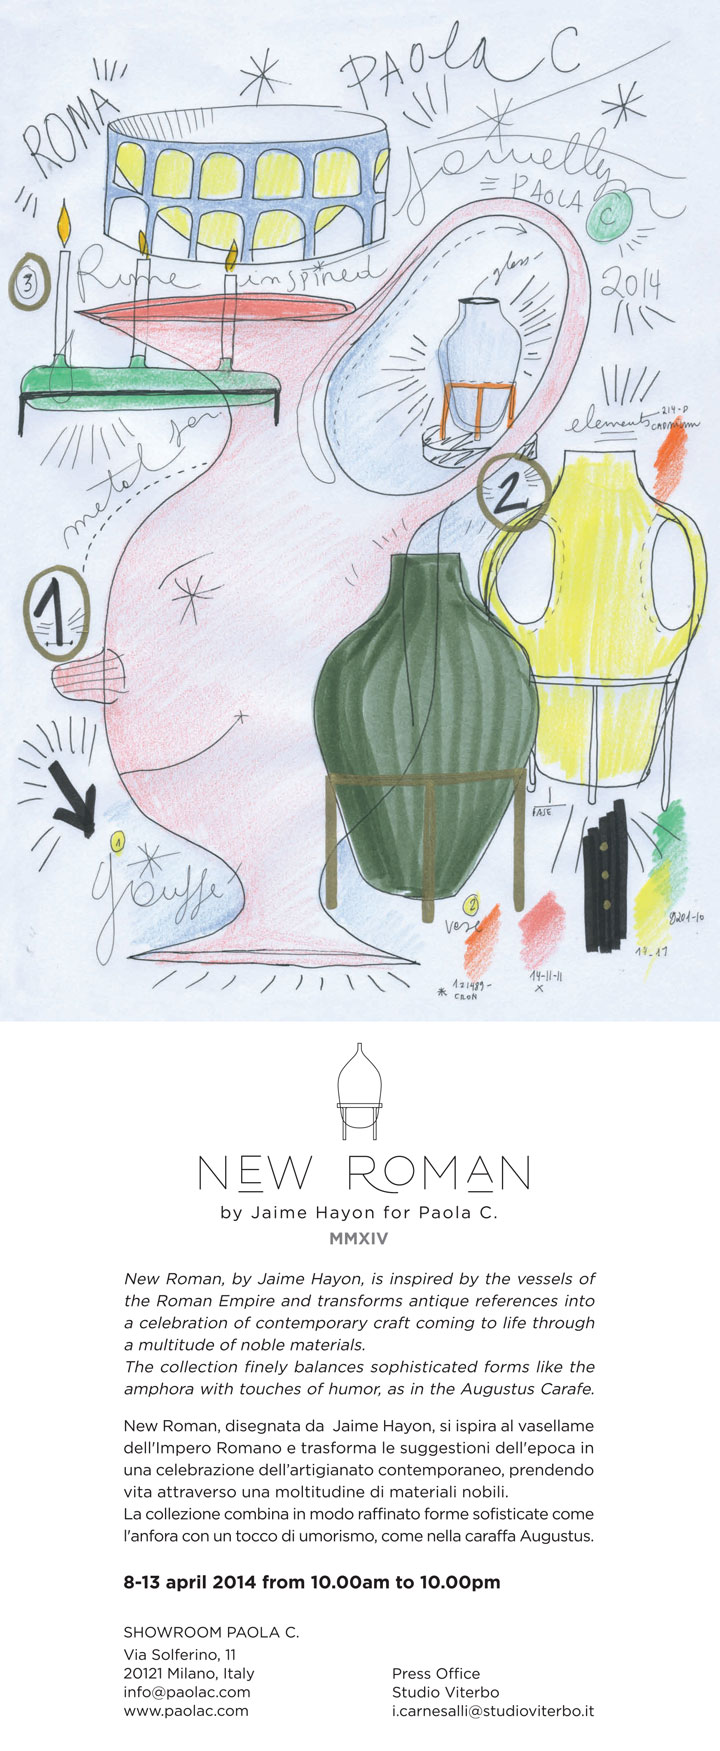 New Roman Jaime Hayon Paola C.